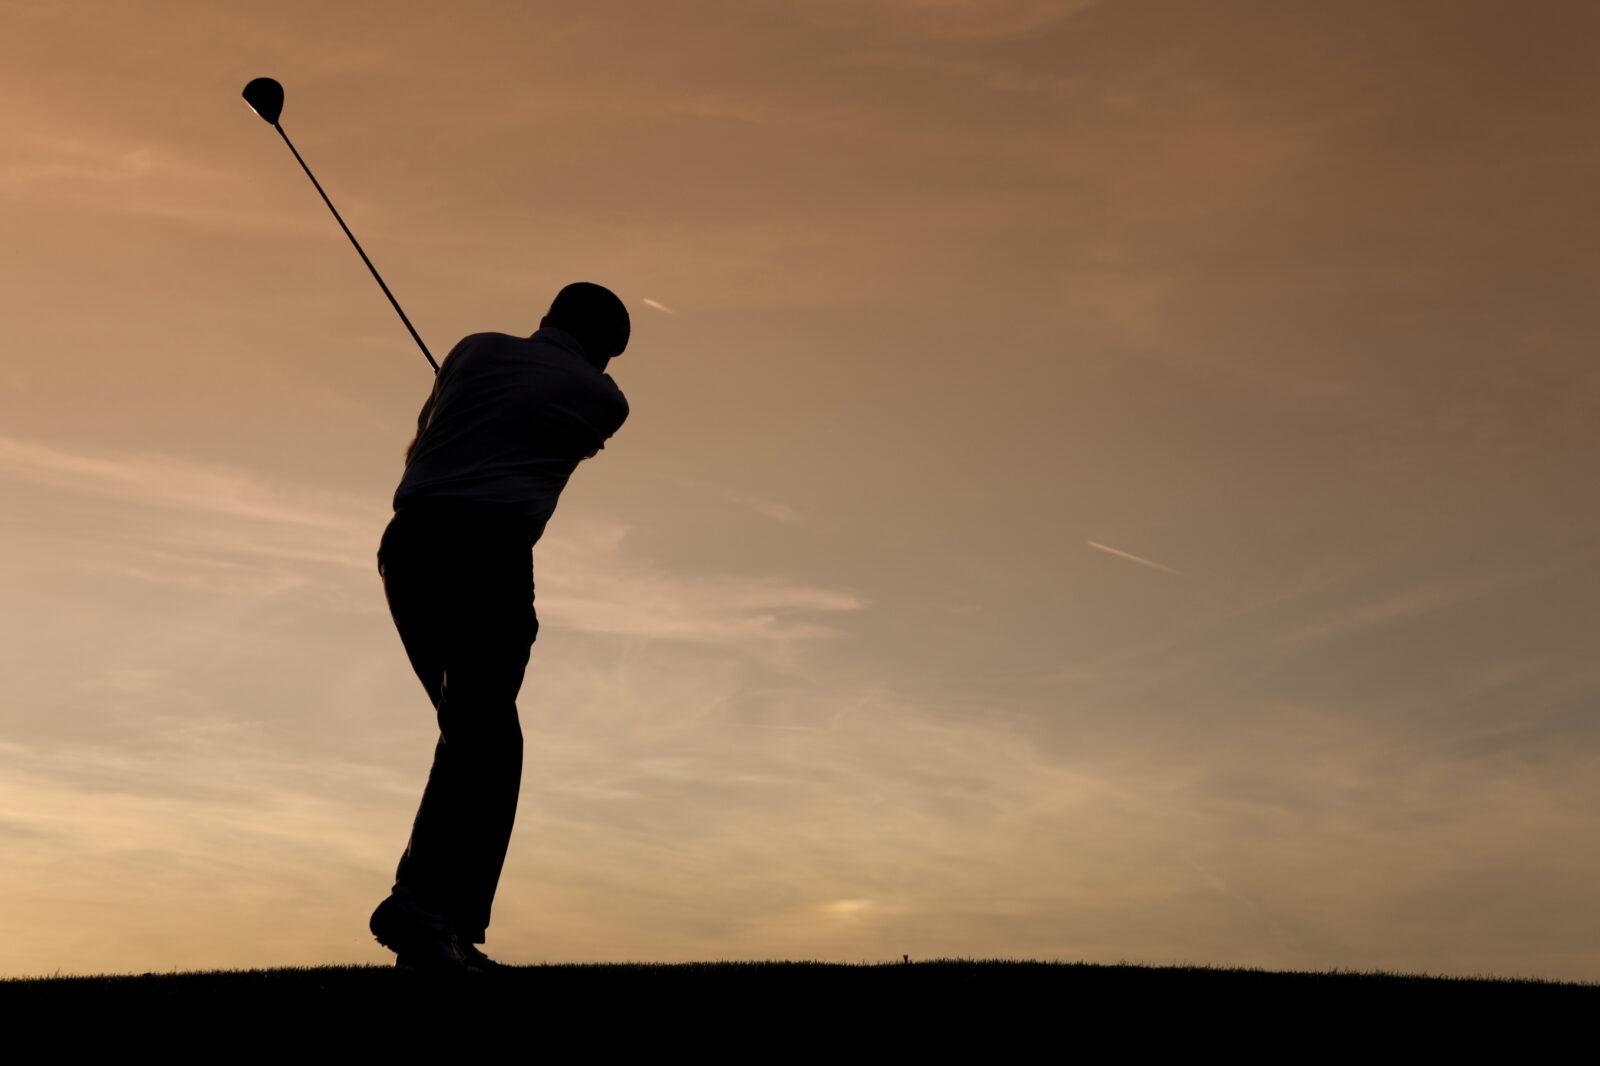 golfer-truepoint-e1570996911235